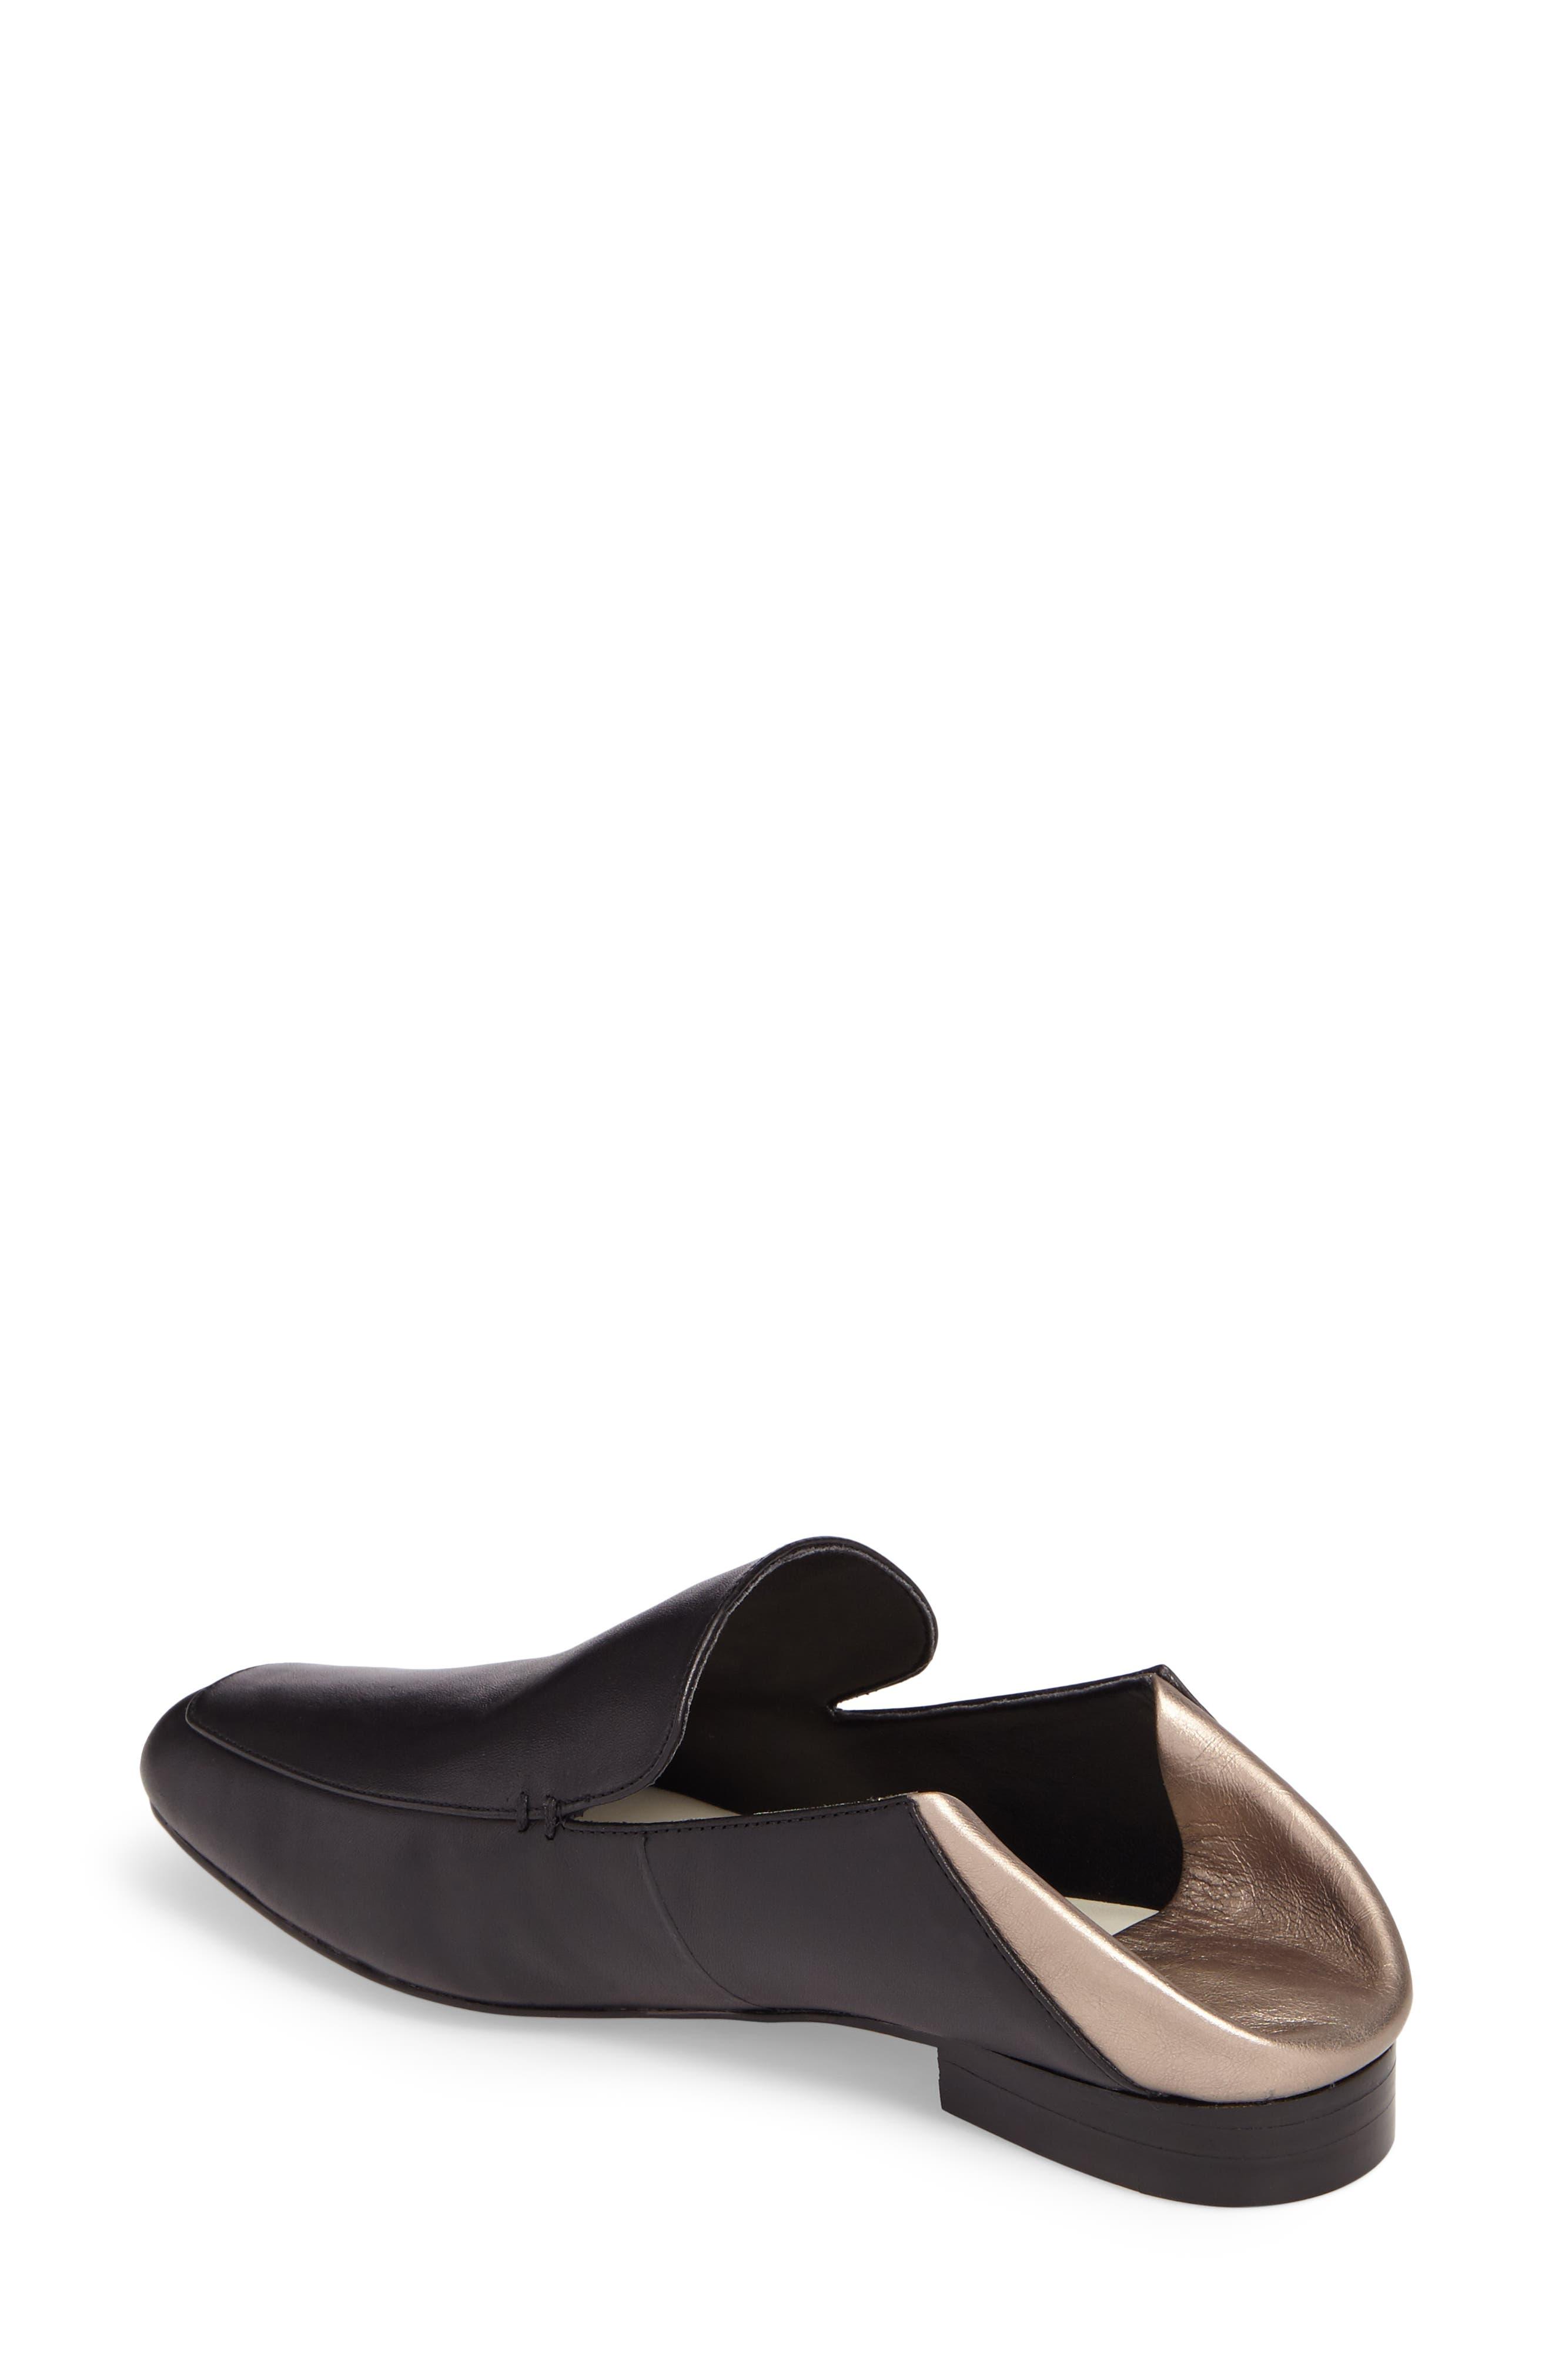 Faun Drop Heel Loafer,                             Alternate thumbnail 3, color,                             003